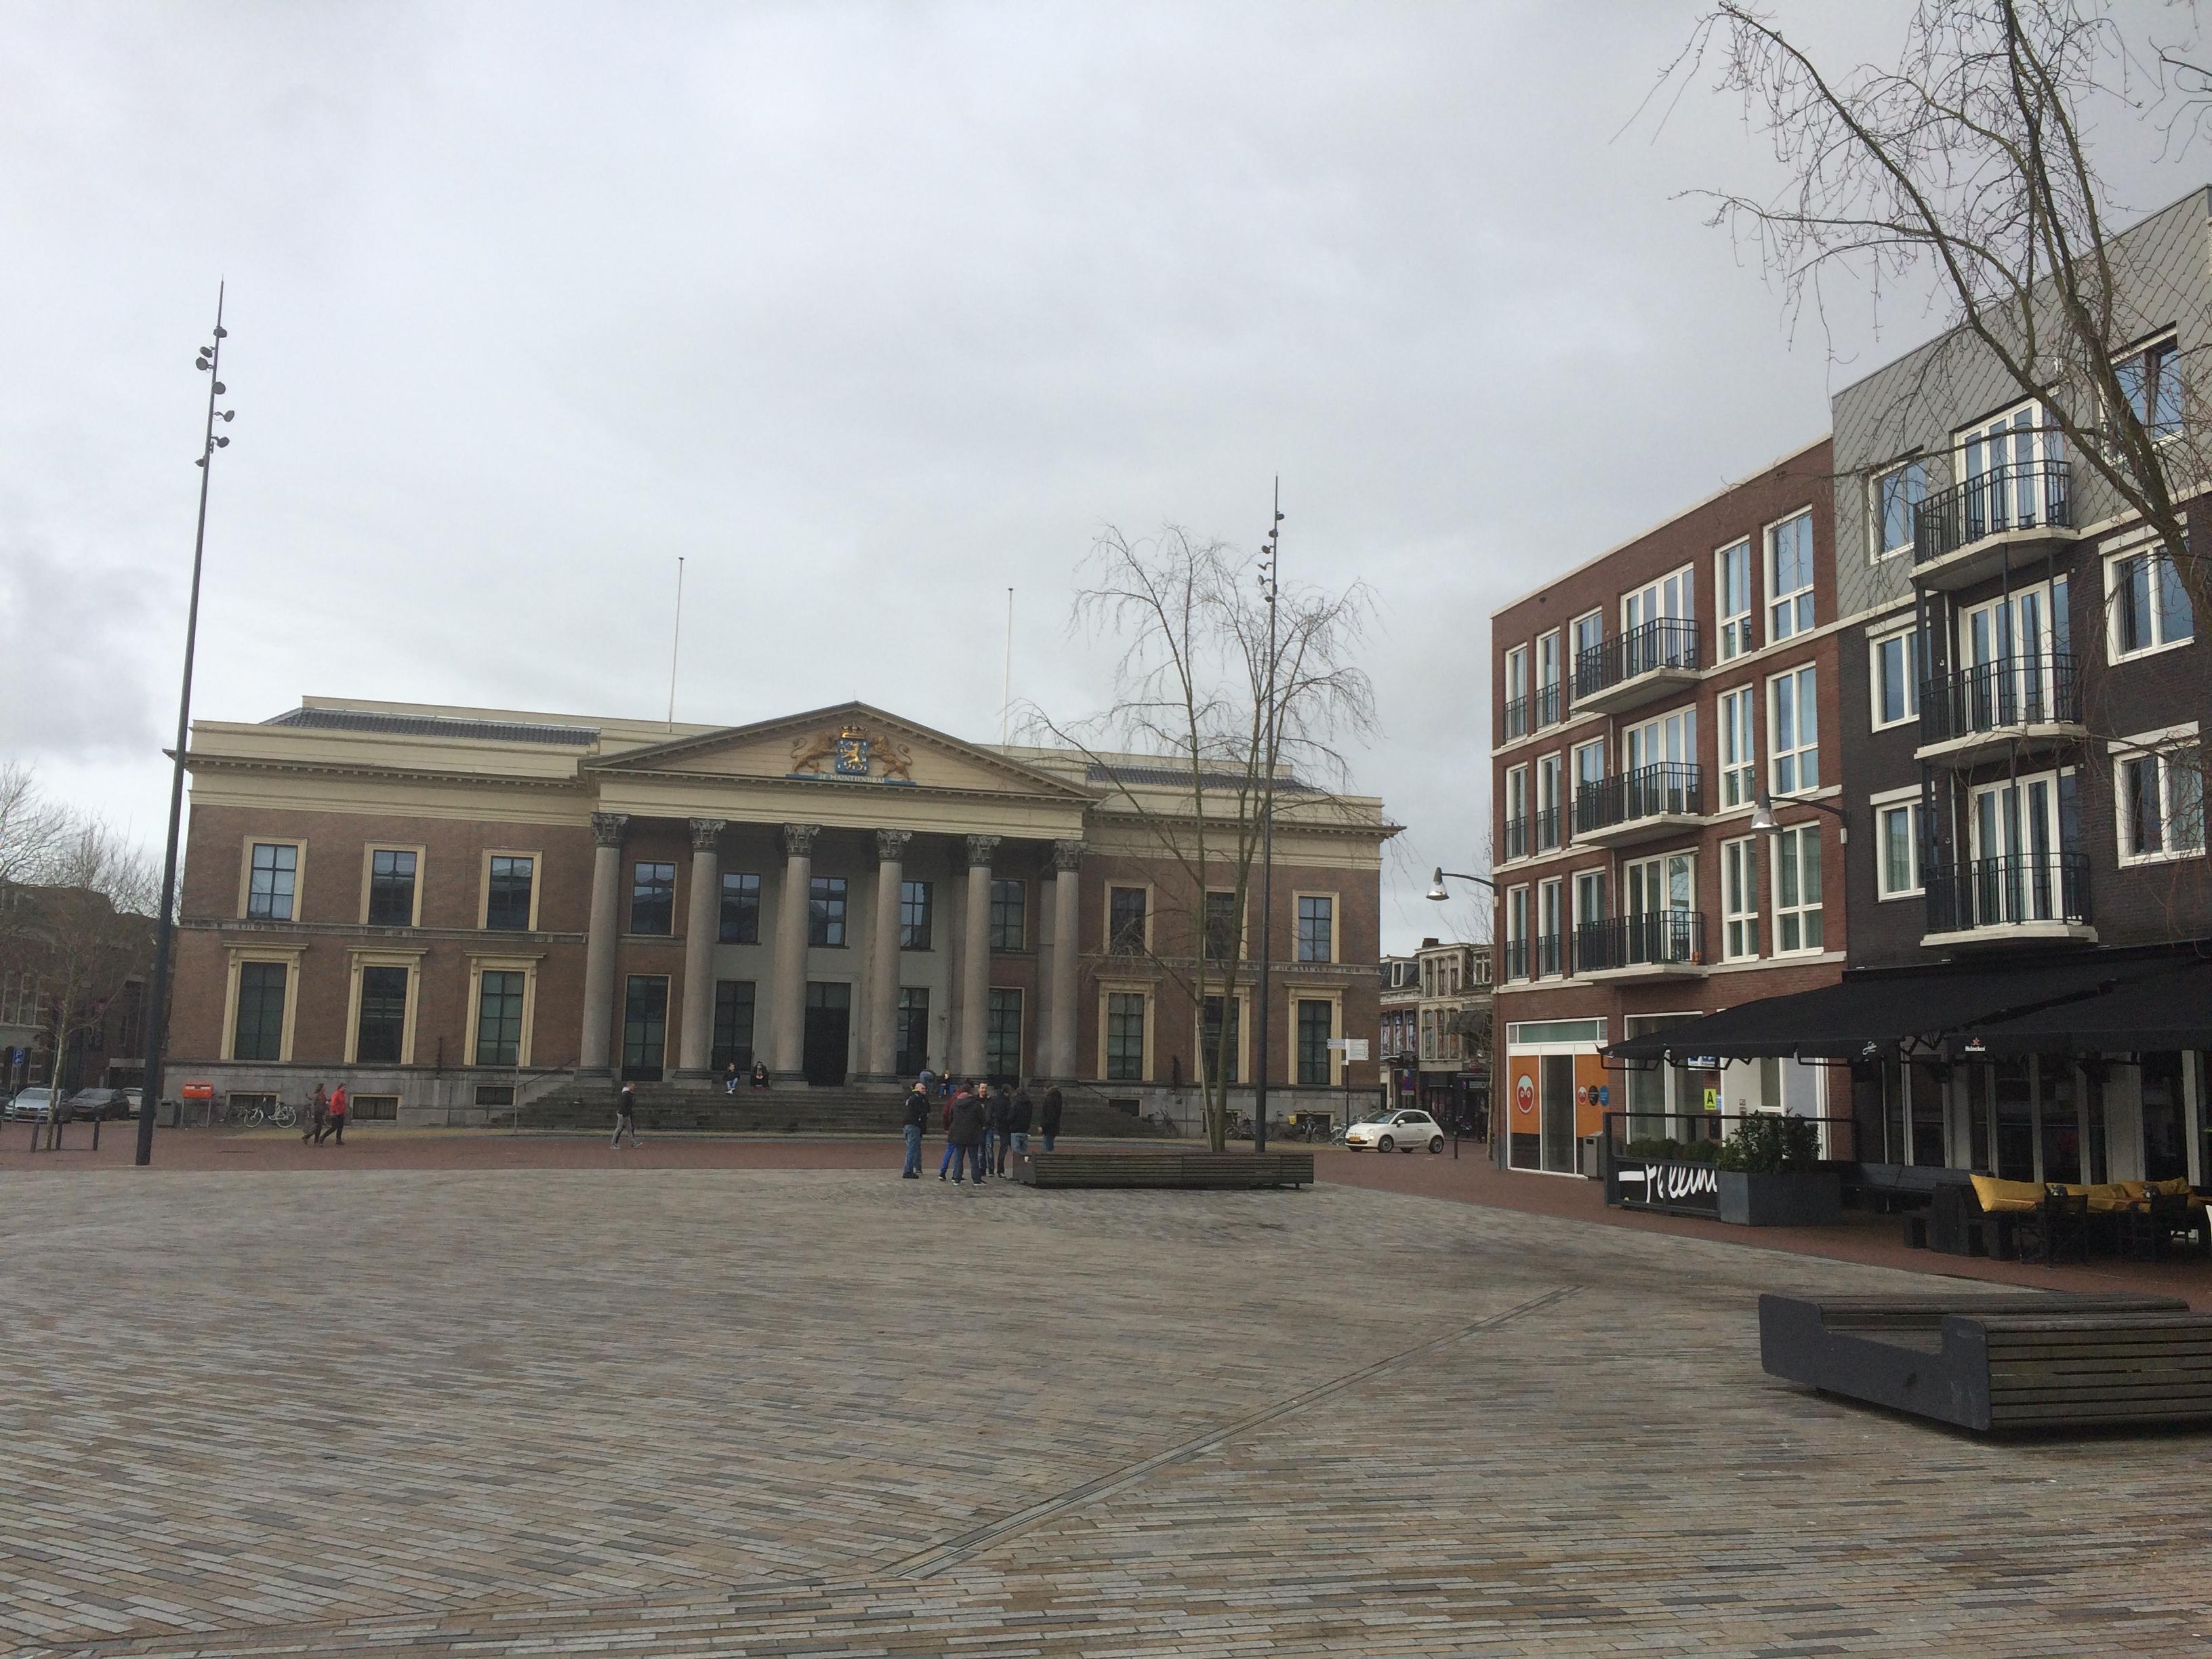 Leeuwarden palais de Justice